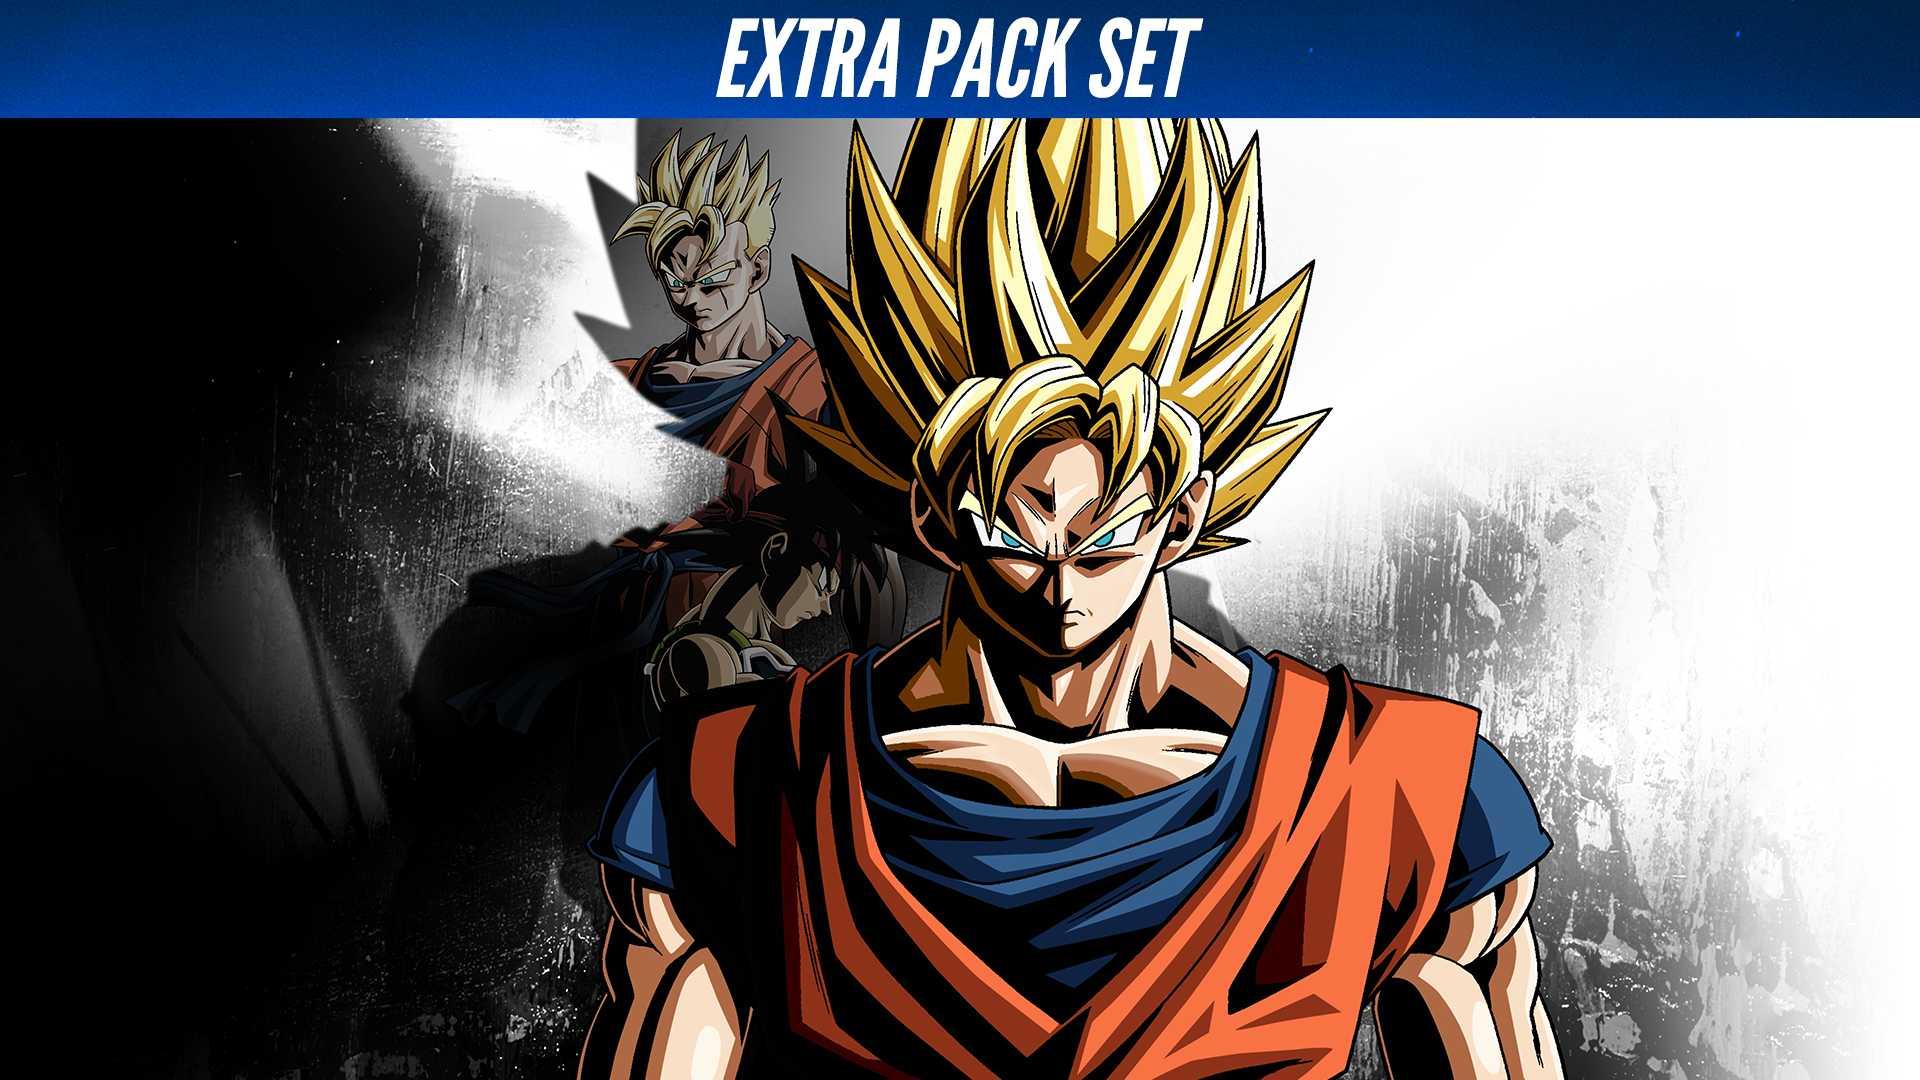 Buy DRAGON BALL XENOVERSE 2 - Extra Pack Set - Xbox Store